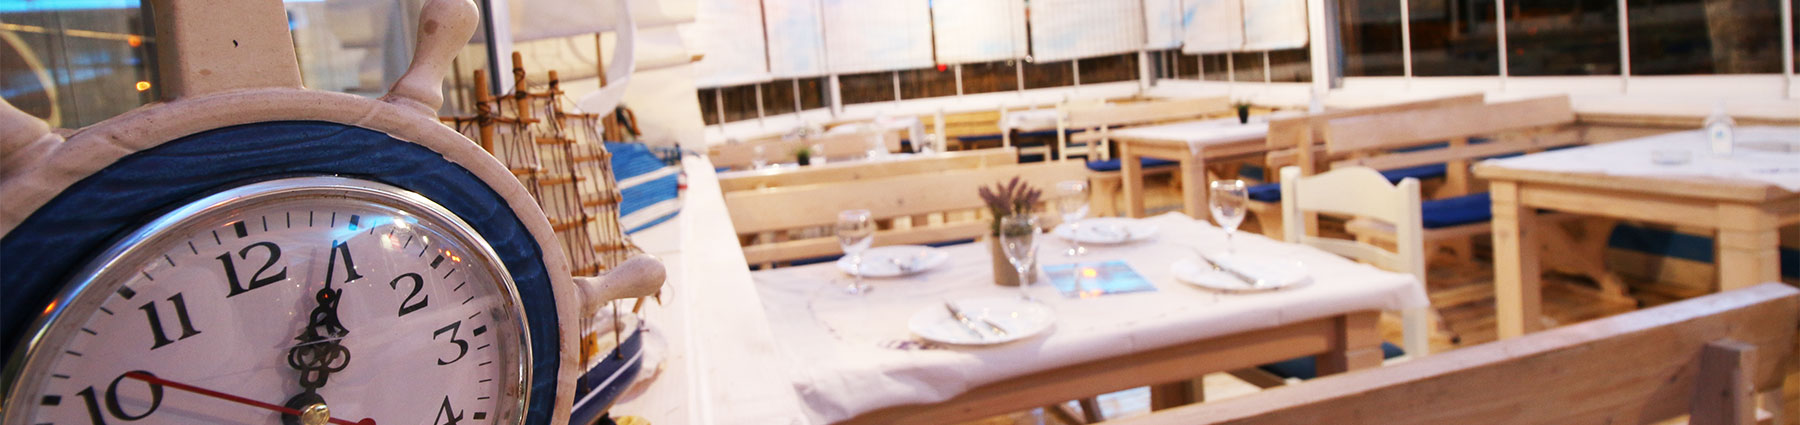 Babe - Fish Restaurant